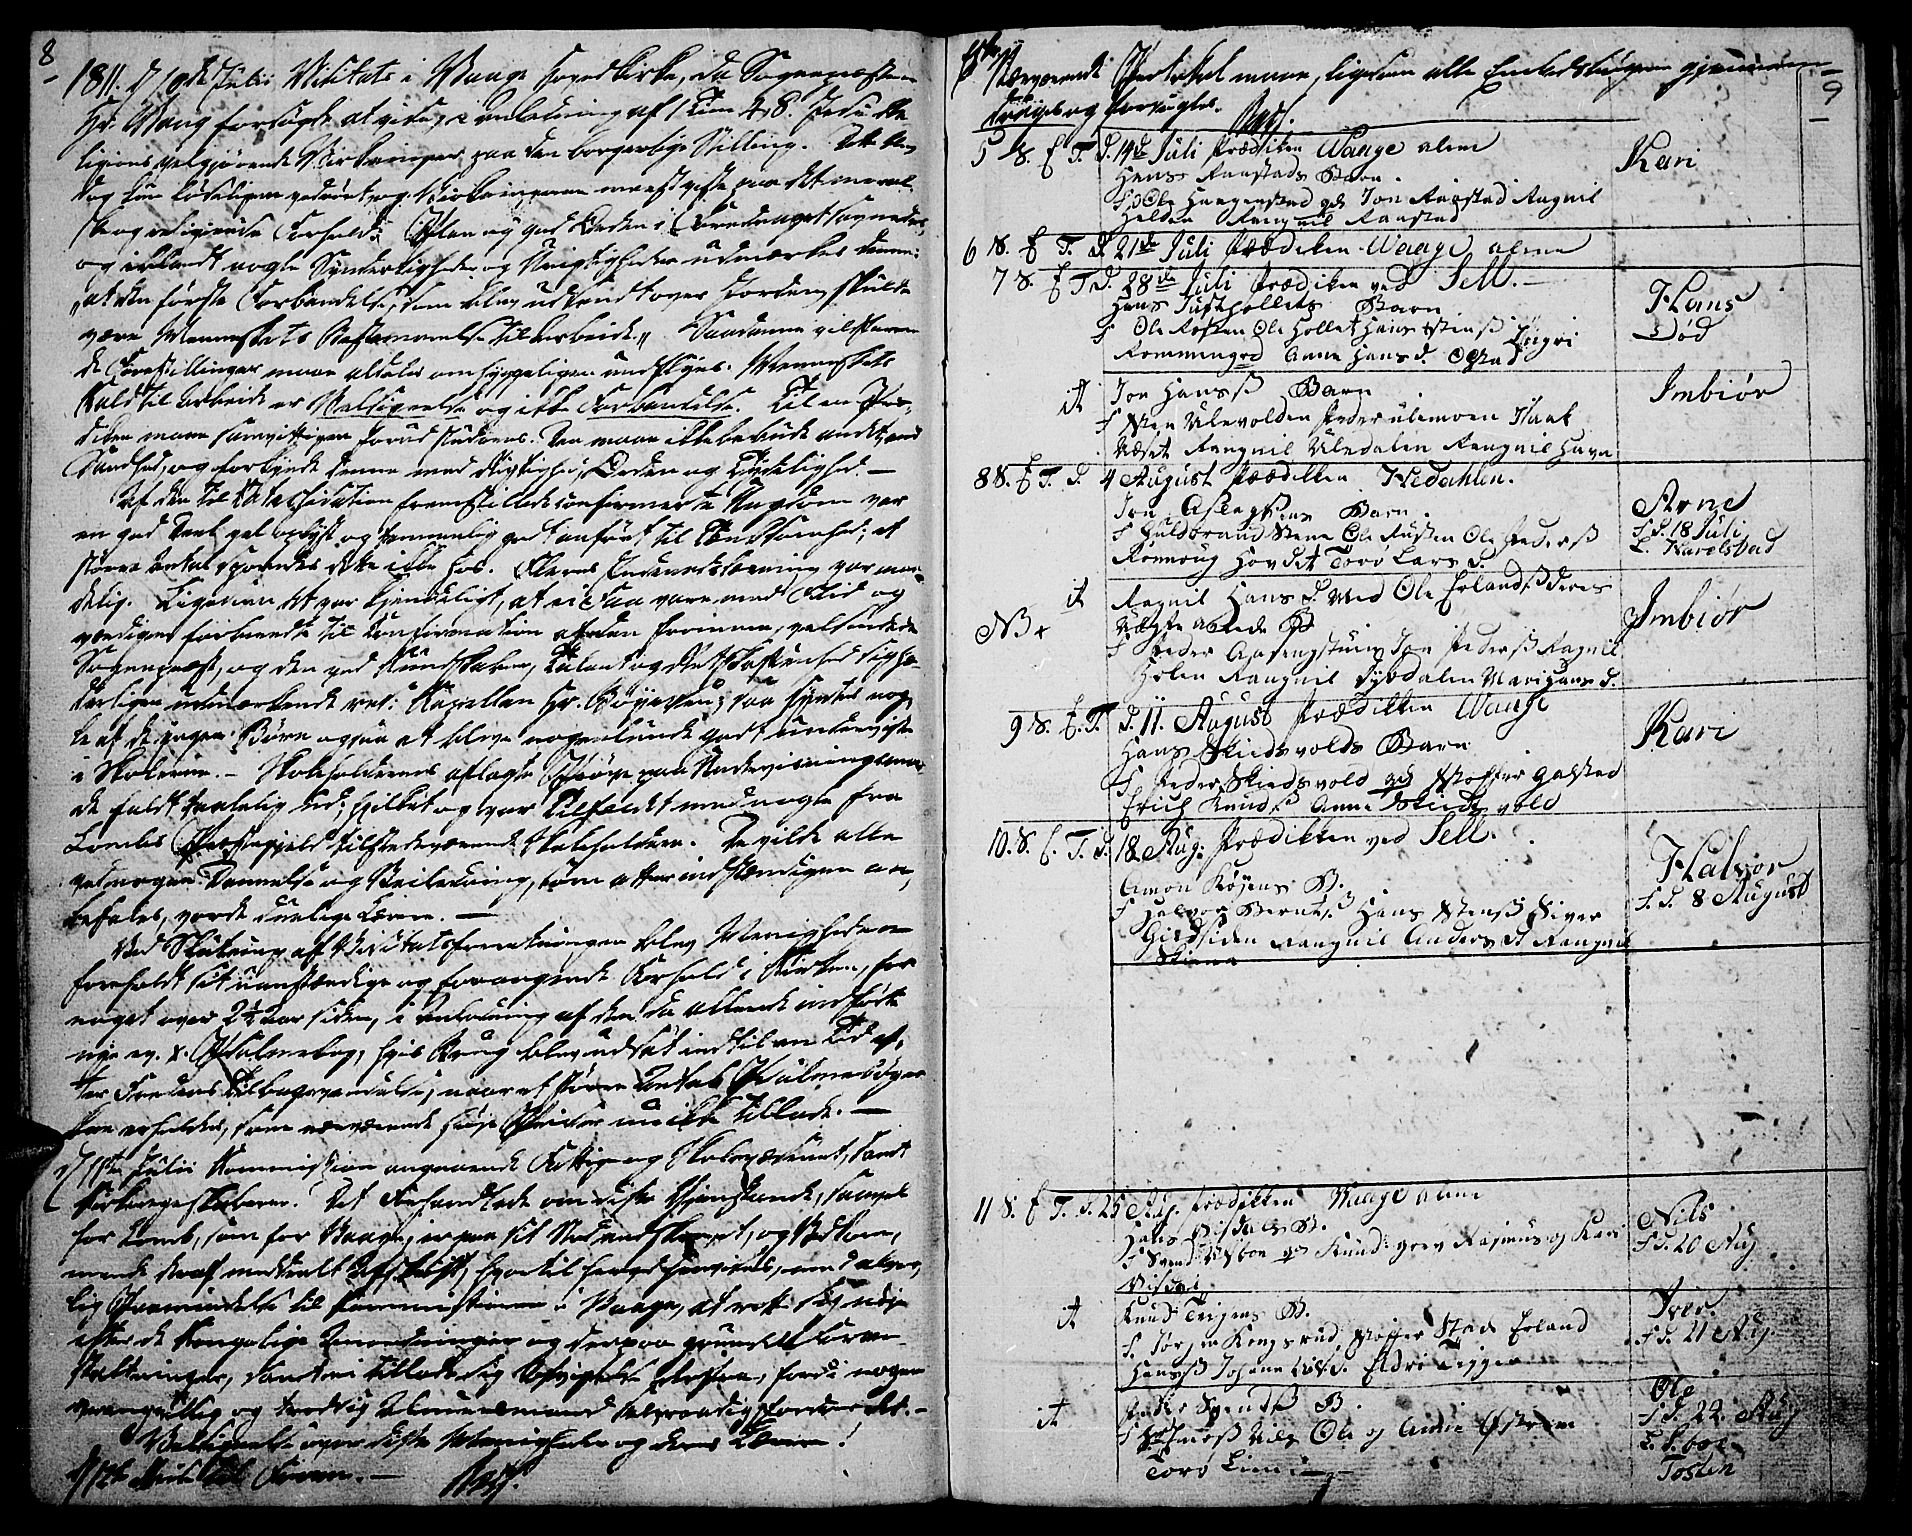 SAH, Vågå prestekontor, Ministerialbok nr. 2, 1810-1815, s. 8-9